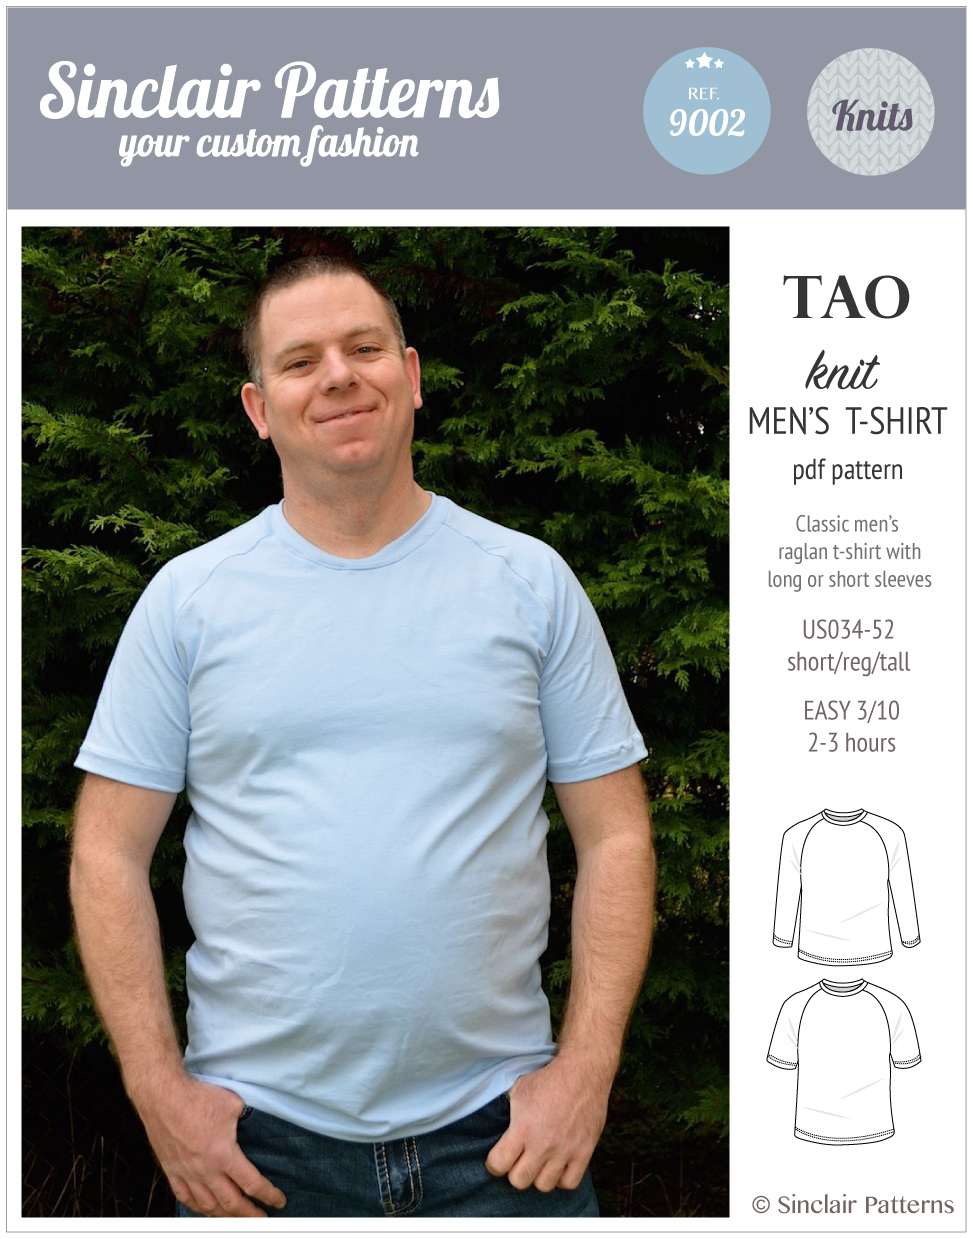 Tao of dating for men pdf free